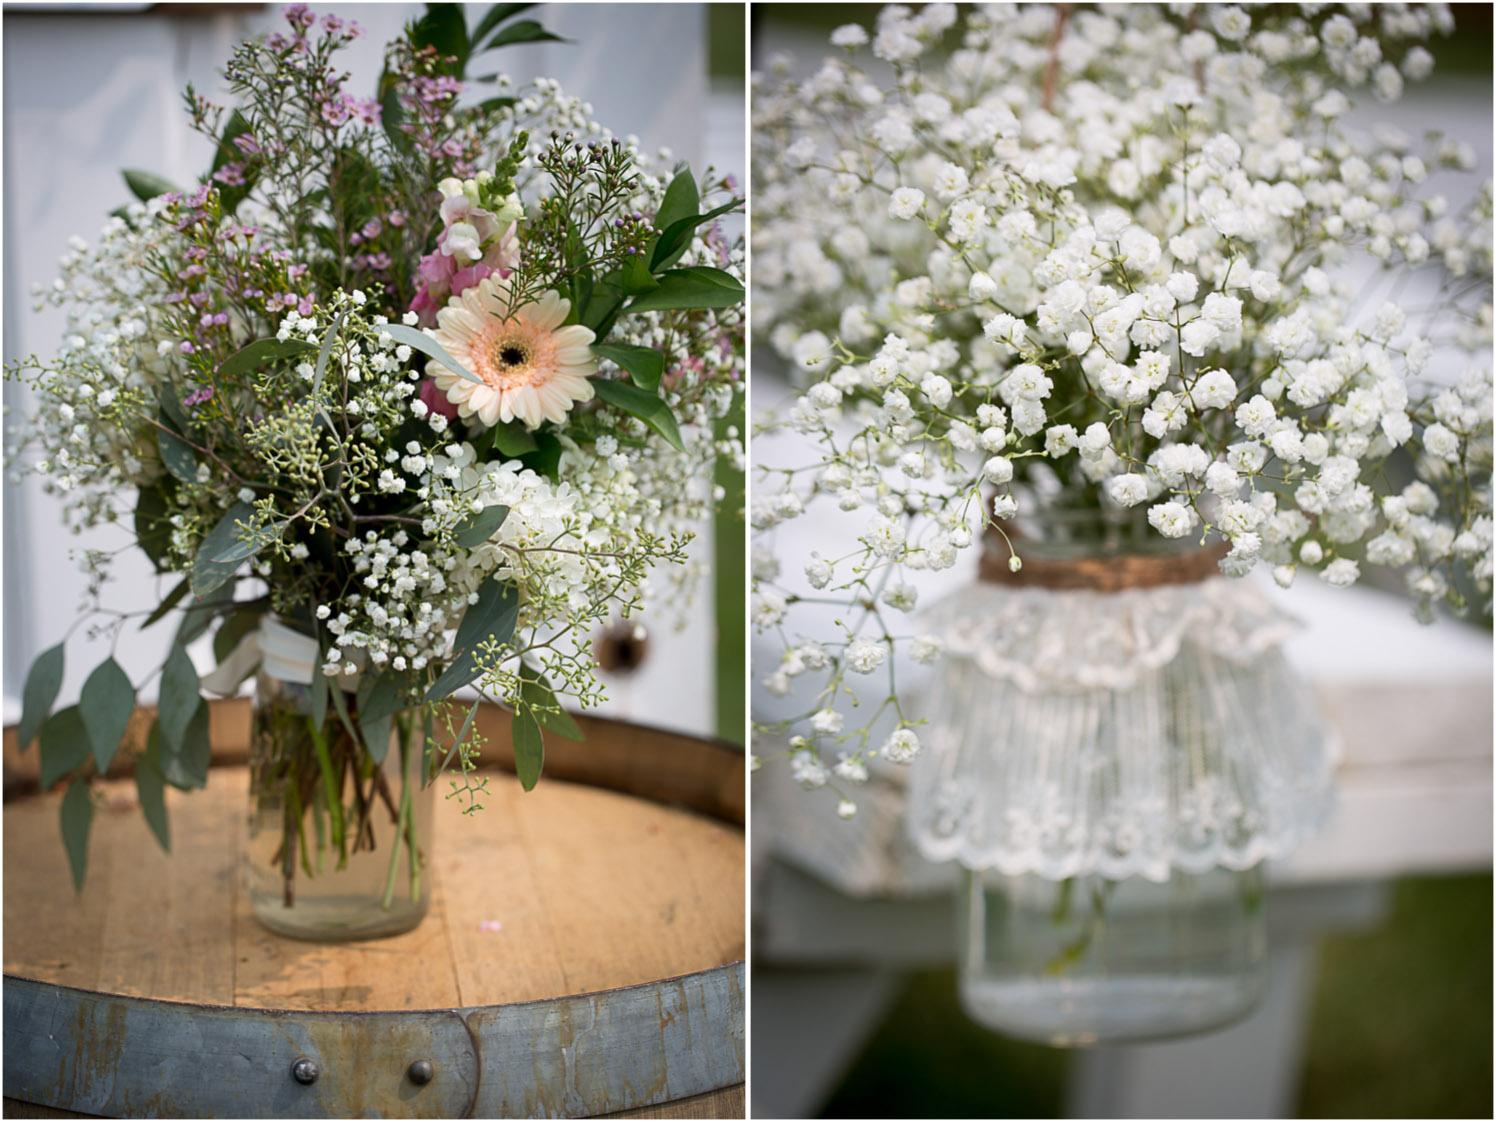 18-ridgetop-prescott-wisconsin-wedding-photographer-rustic-farm-cornfield-ceremony-details-floral-babys-breath-flowers-mahonen-photography.jpg